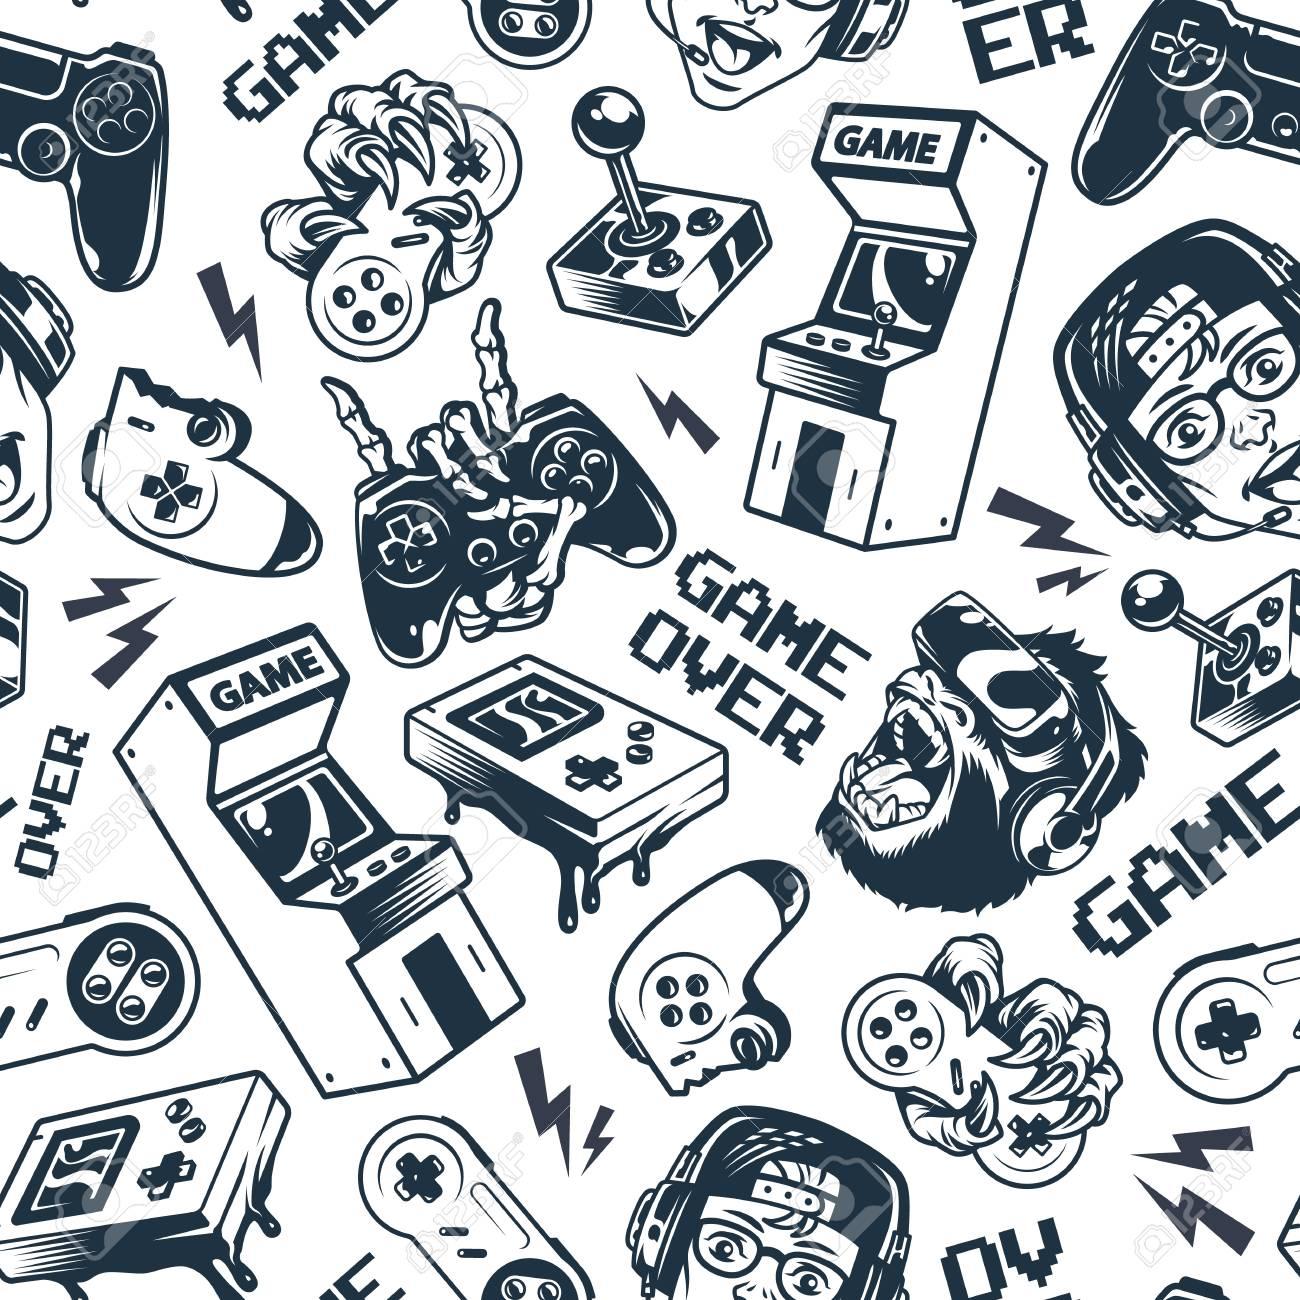 Vintage gaming seamless pattern with joysticks gamepad gorilla in virtual reality headset broken gamepad retro arcade game machine pocket console vector illustration - 115207072